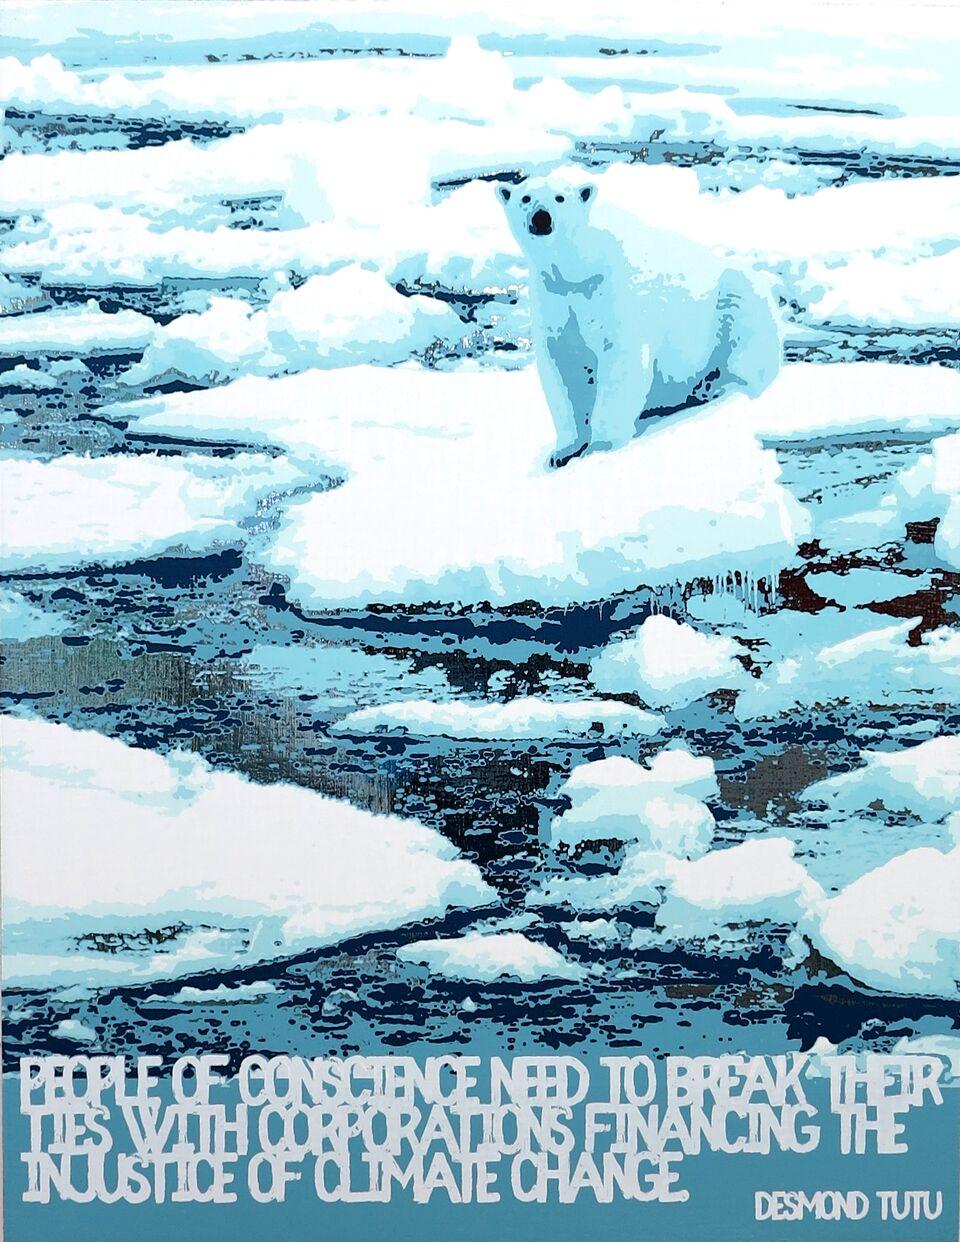 Polar Bear/Global Warming (Desmond Tutu)